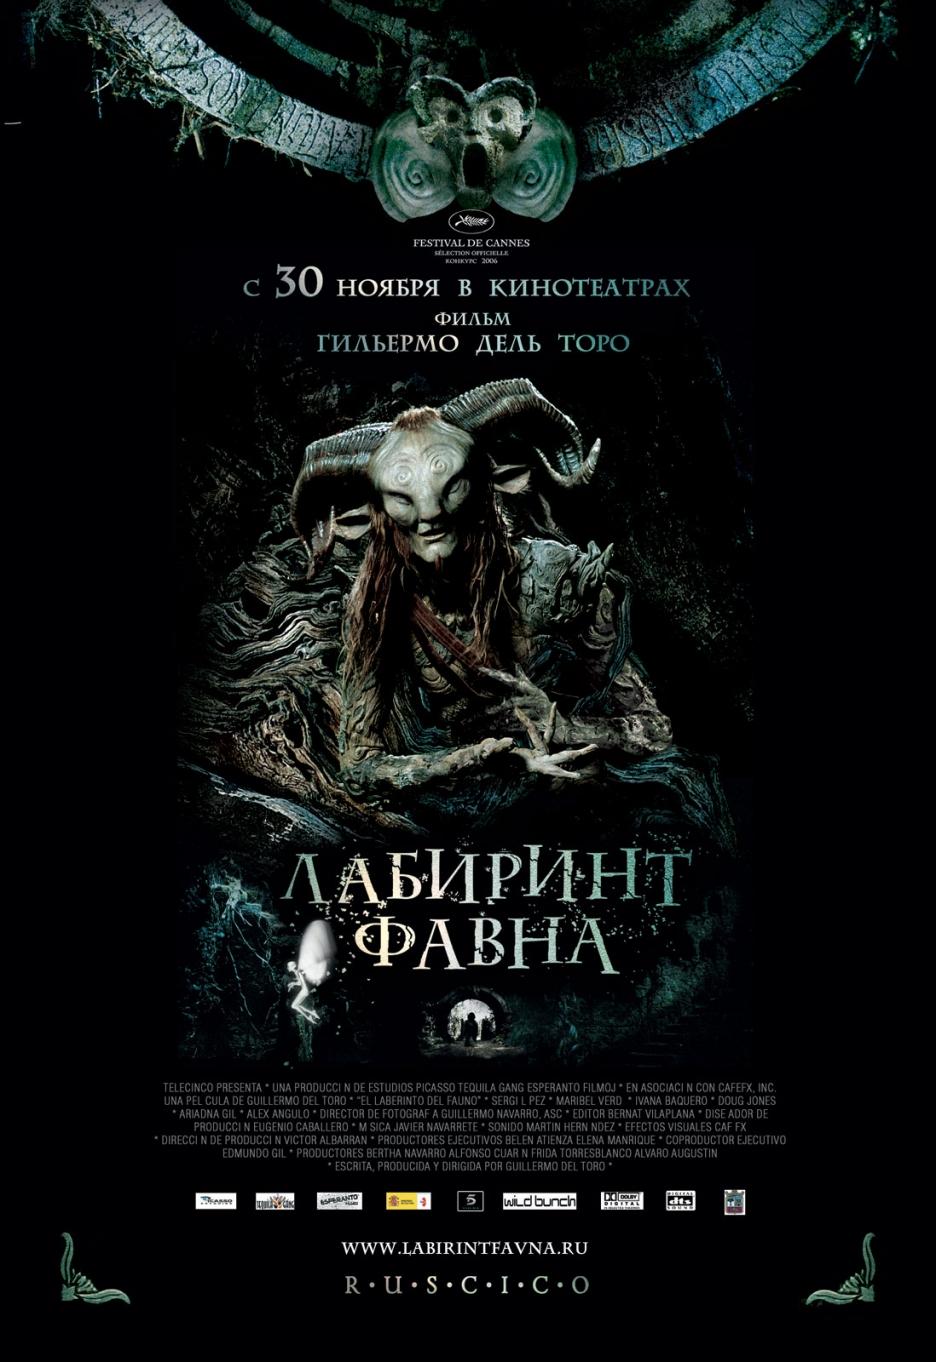 Pan's Labyrinth (2006) – HORRORPEDIA Labyrinth Cast